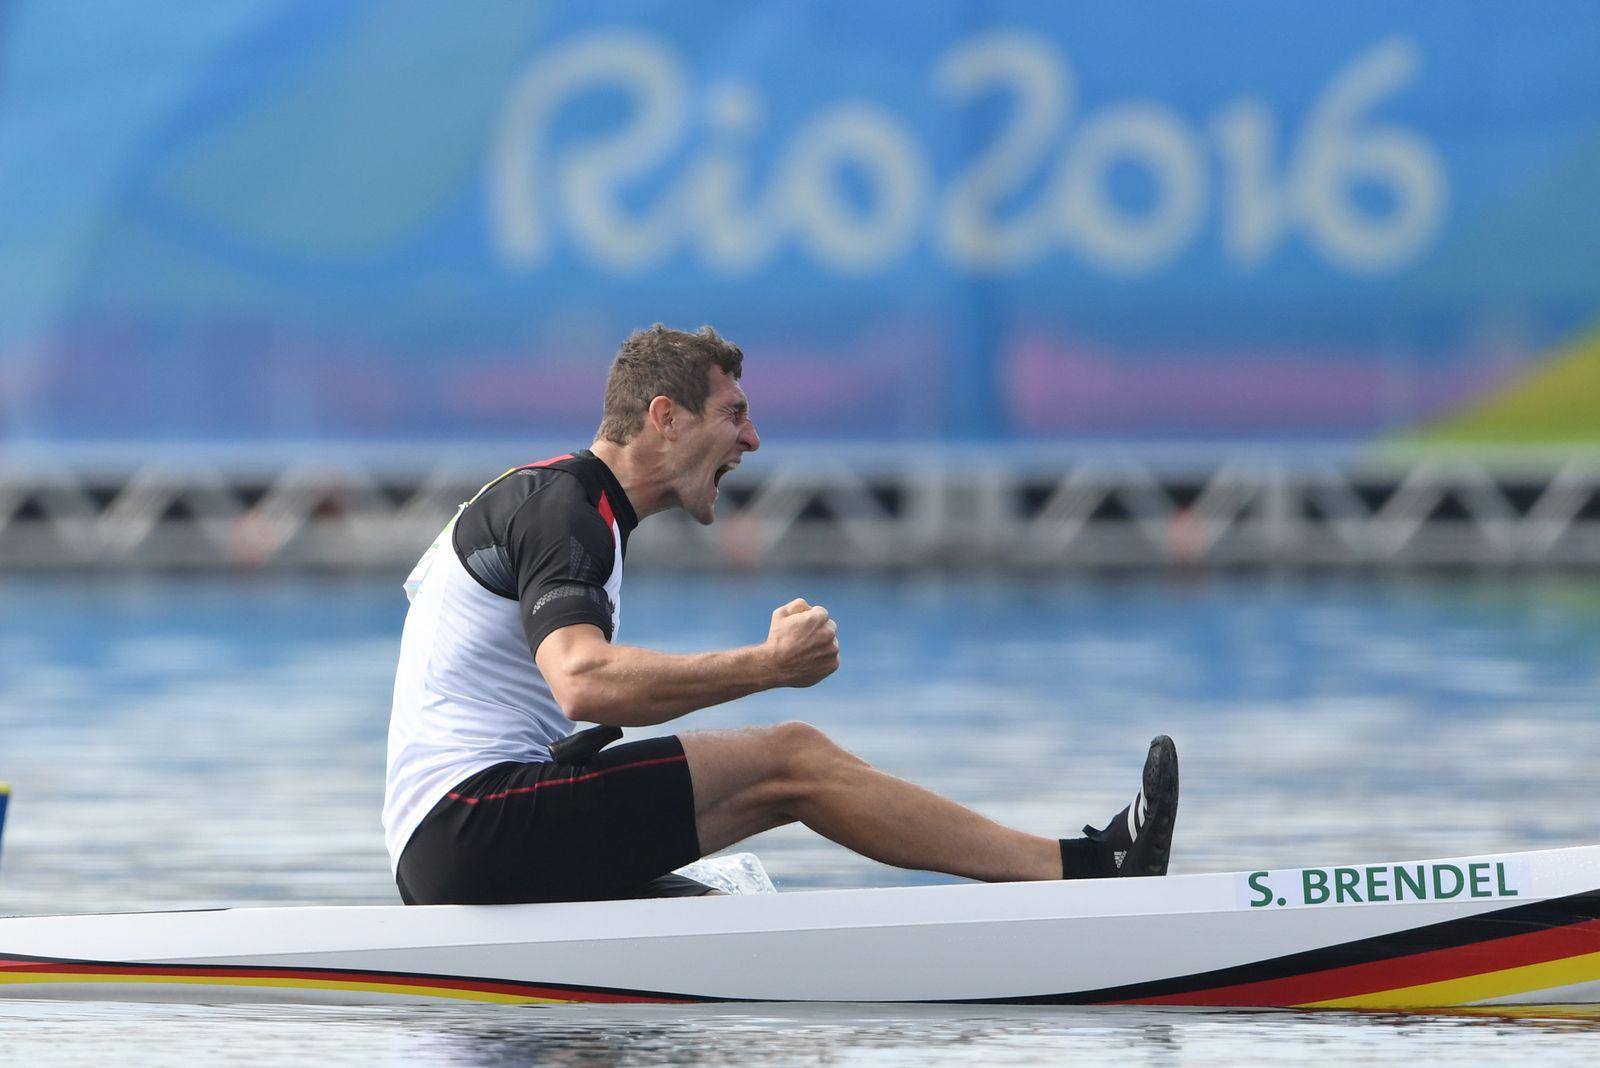 HIGHLIGHTS/ Olympia 2016 Rio de Janeiro/ Sebastian Brendel